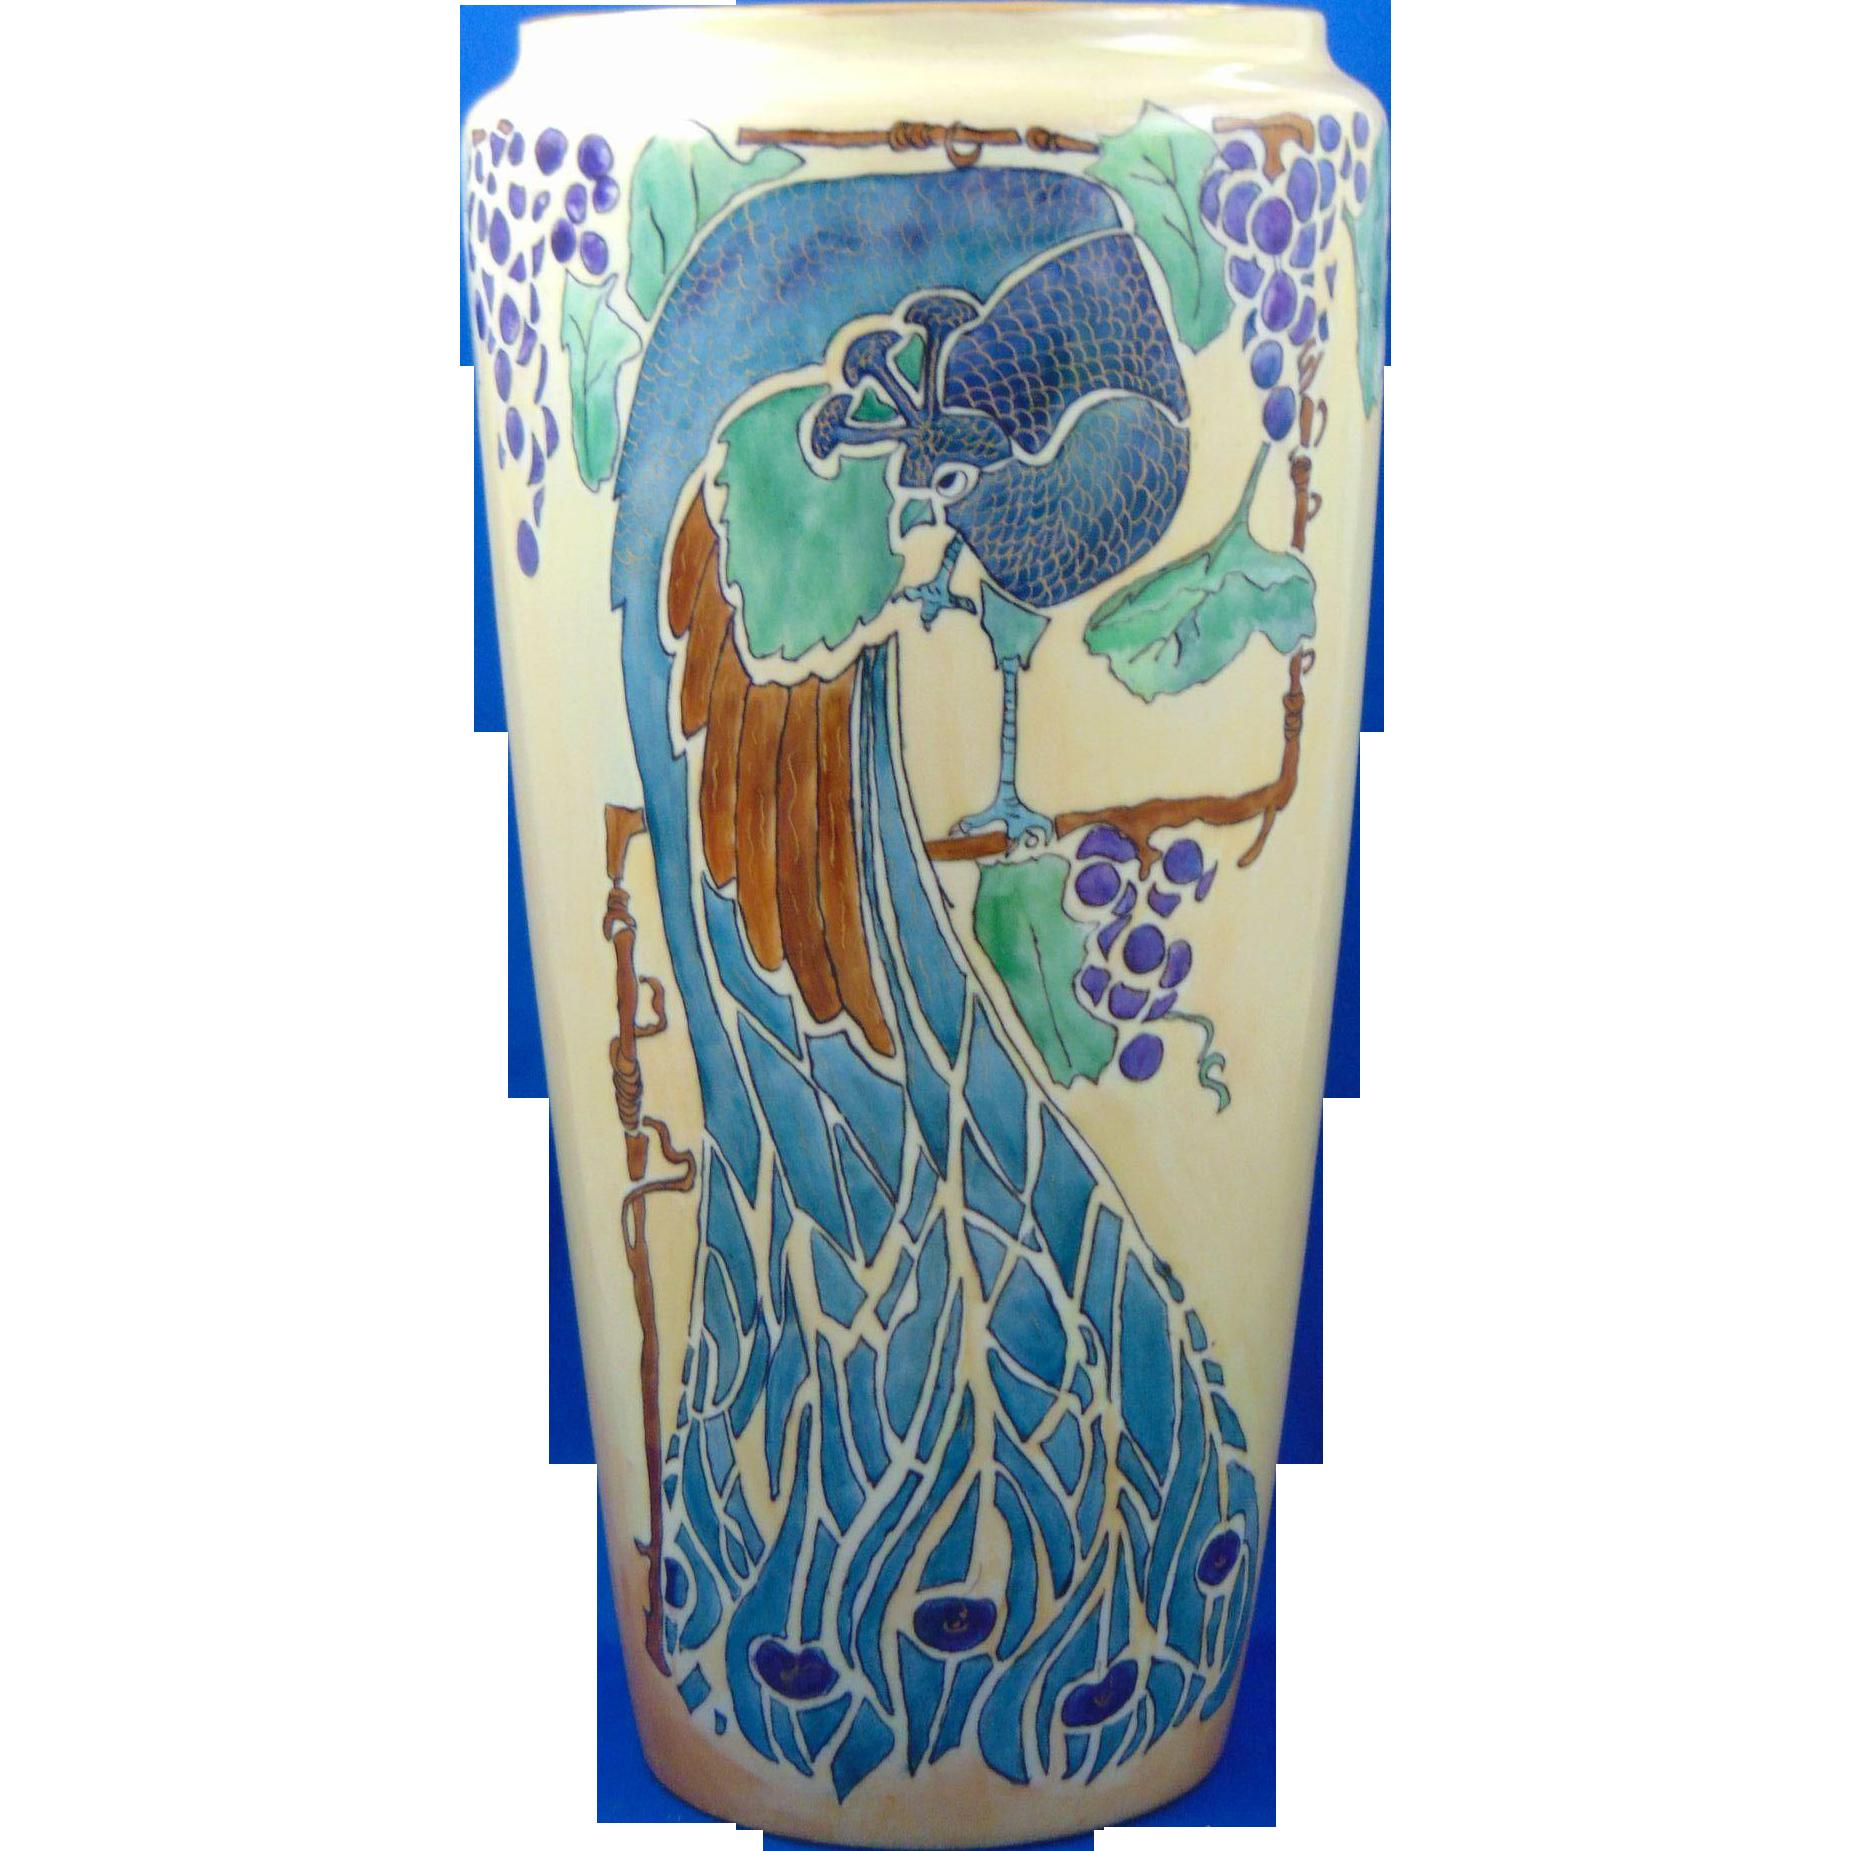 Bernardaud & Co. (B&Co.) Limoges Arts & Crafts Peacock & Grapes Motif Vase (c.1900-1914)